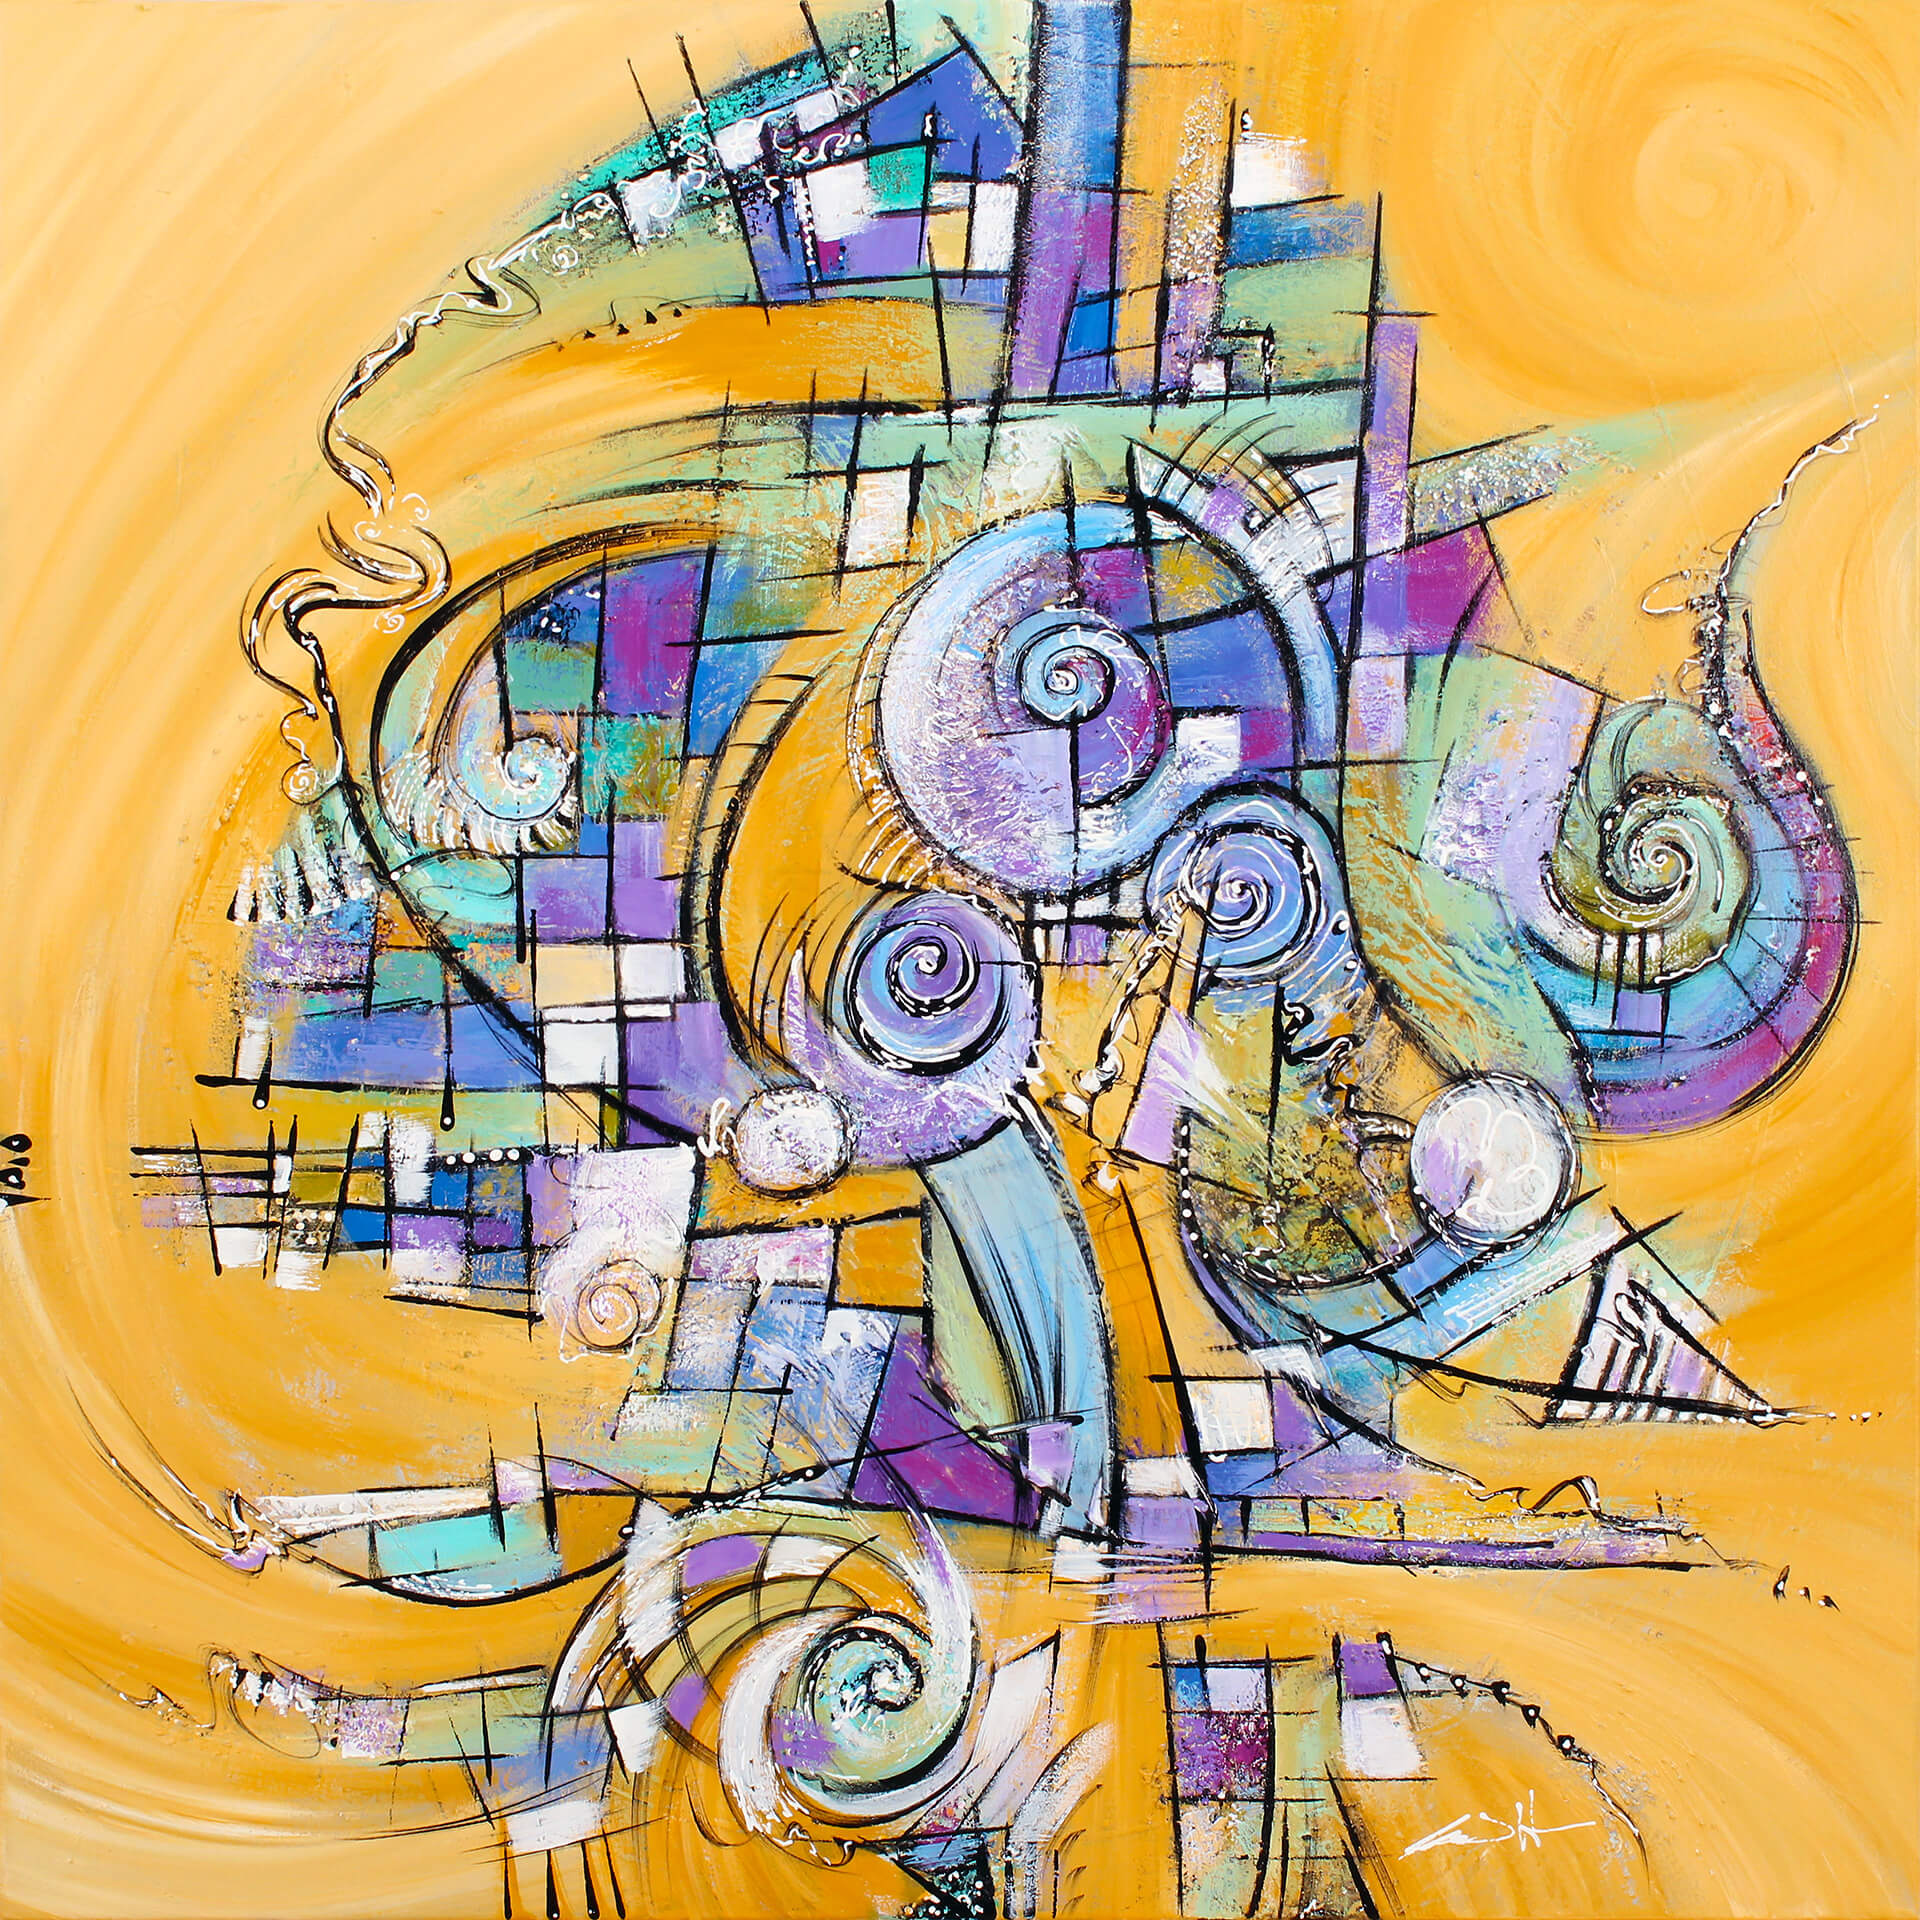 art-eric-j-hughes-artiste-peintre-canadien-tableau-symbiose-quoi-fur